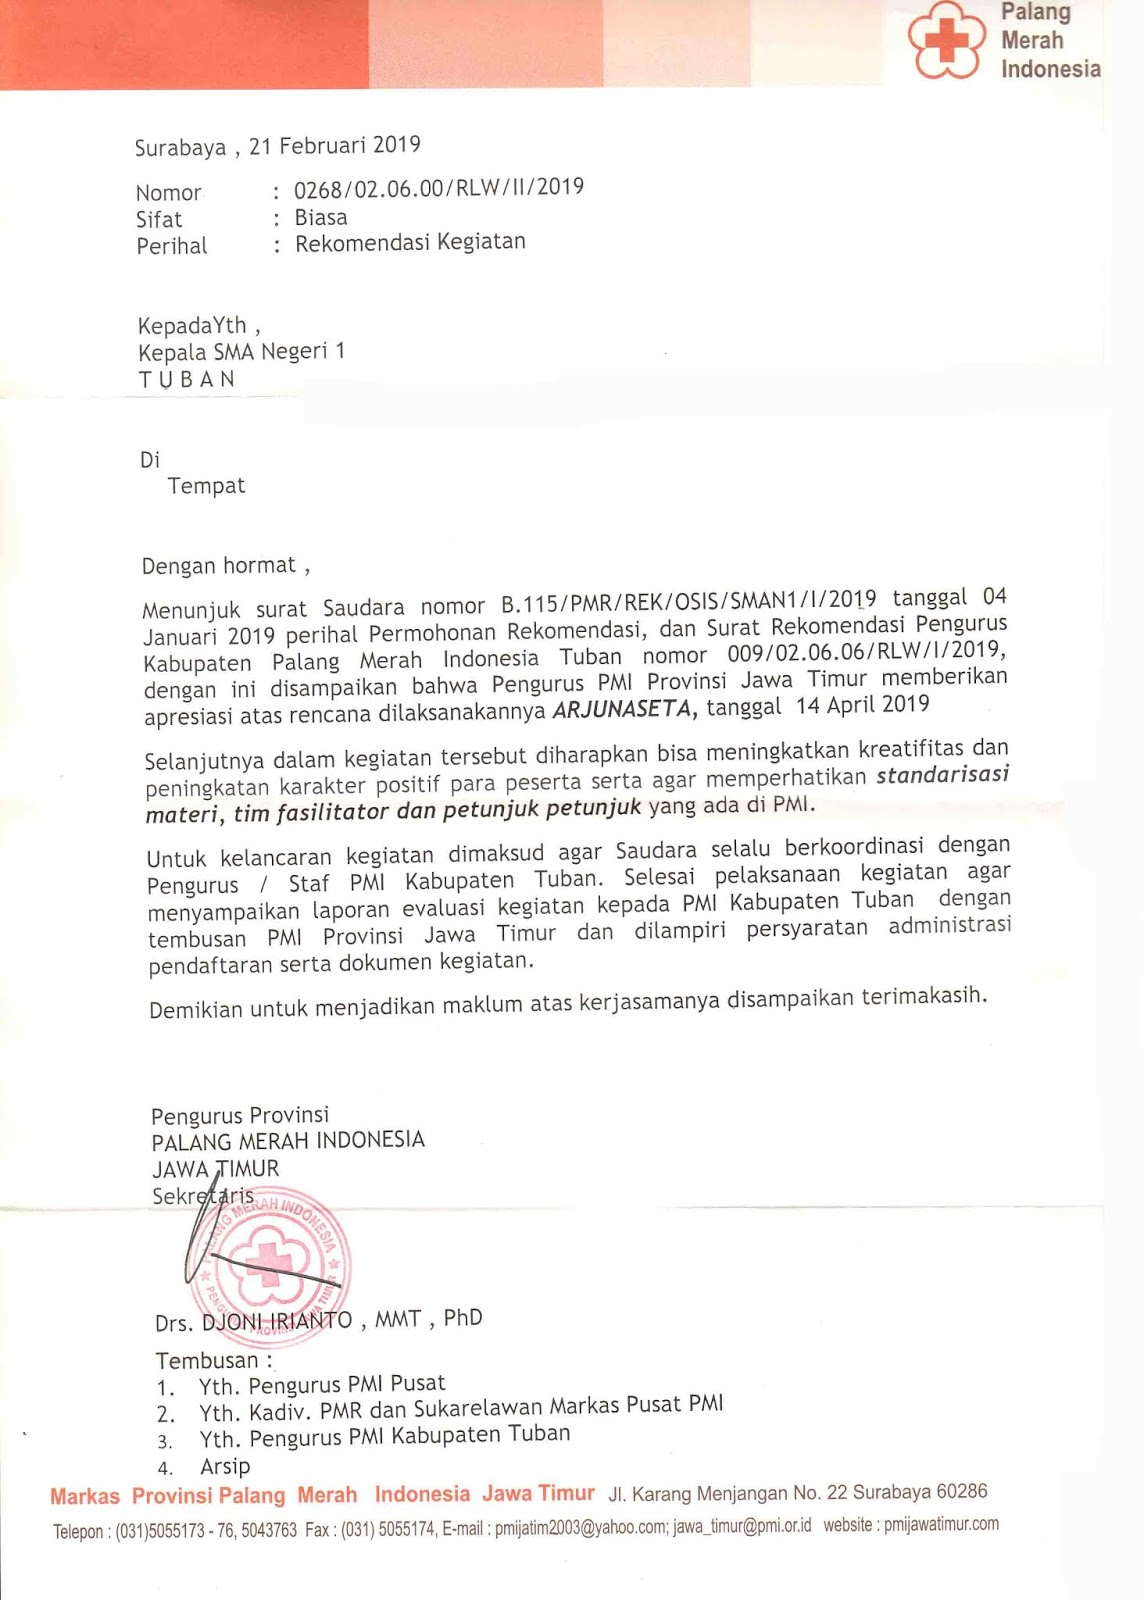 Pmr Sma Negeri 1 Tuban Surat Rekomendasi Kegiatan Dari Pmi